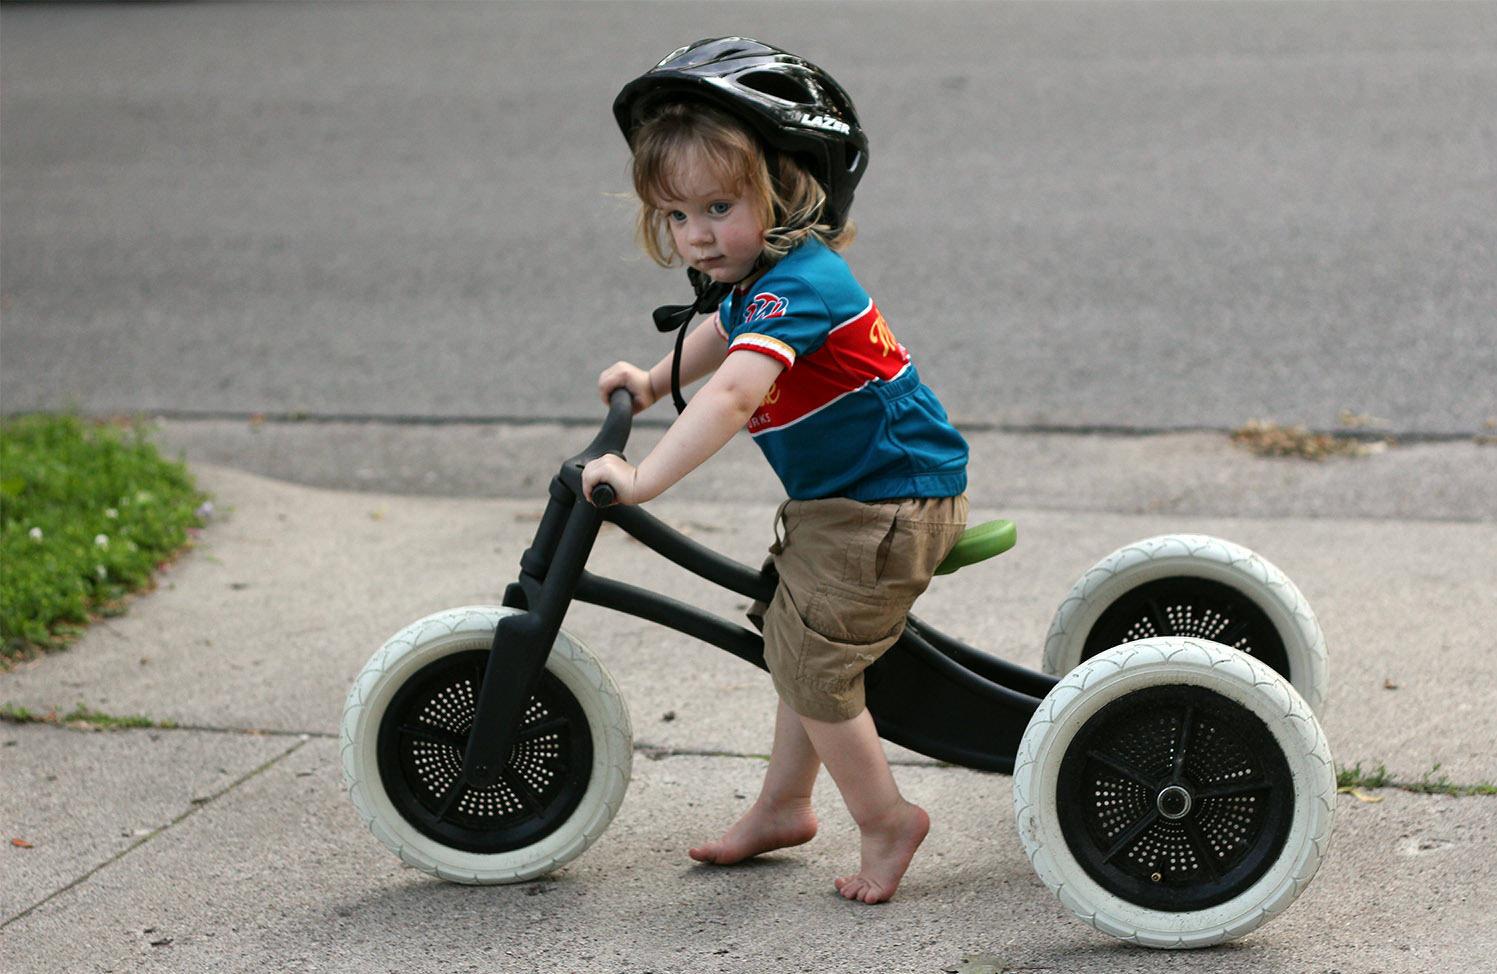 The Yuba Balance Trainer Bicycle A Push Bike Without Drivetrain Allows